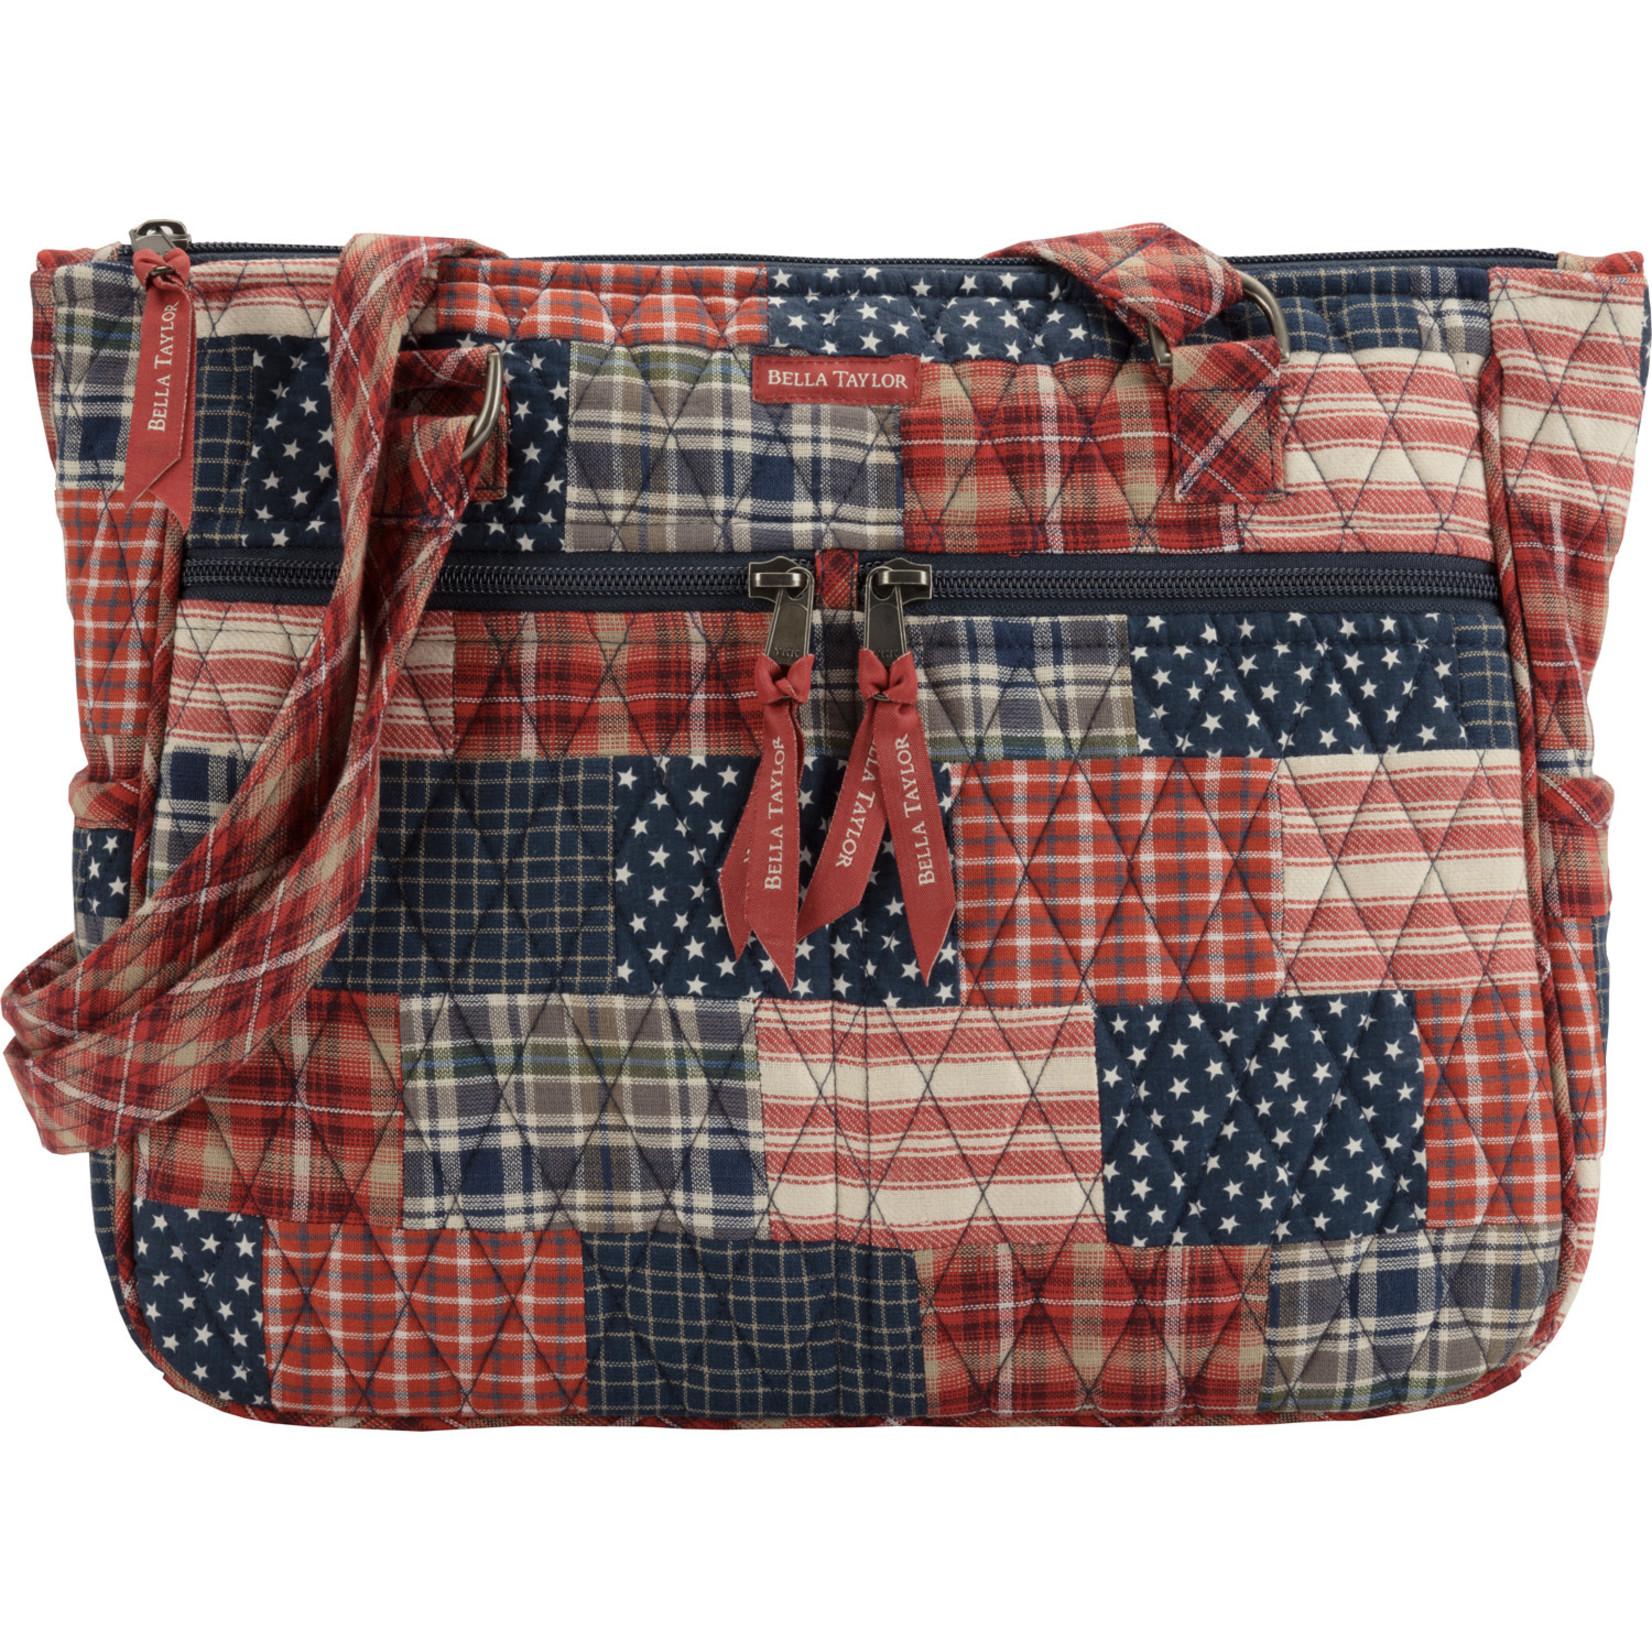 Bella Taylor Revere - Everyday handbag